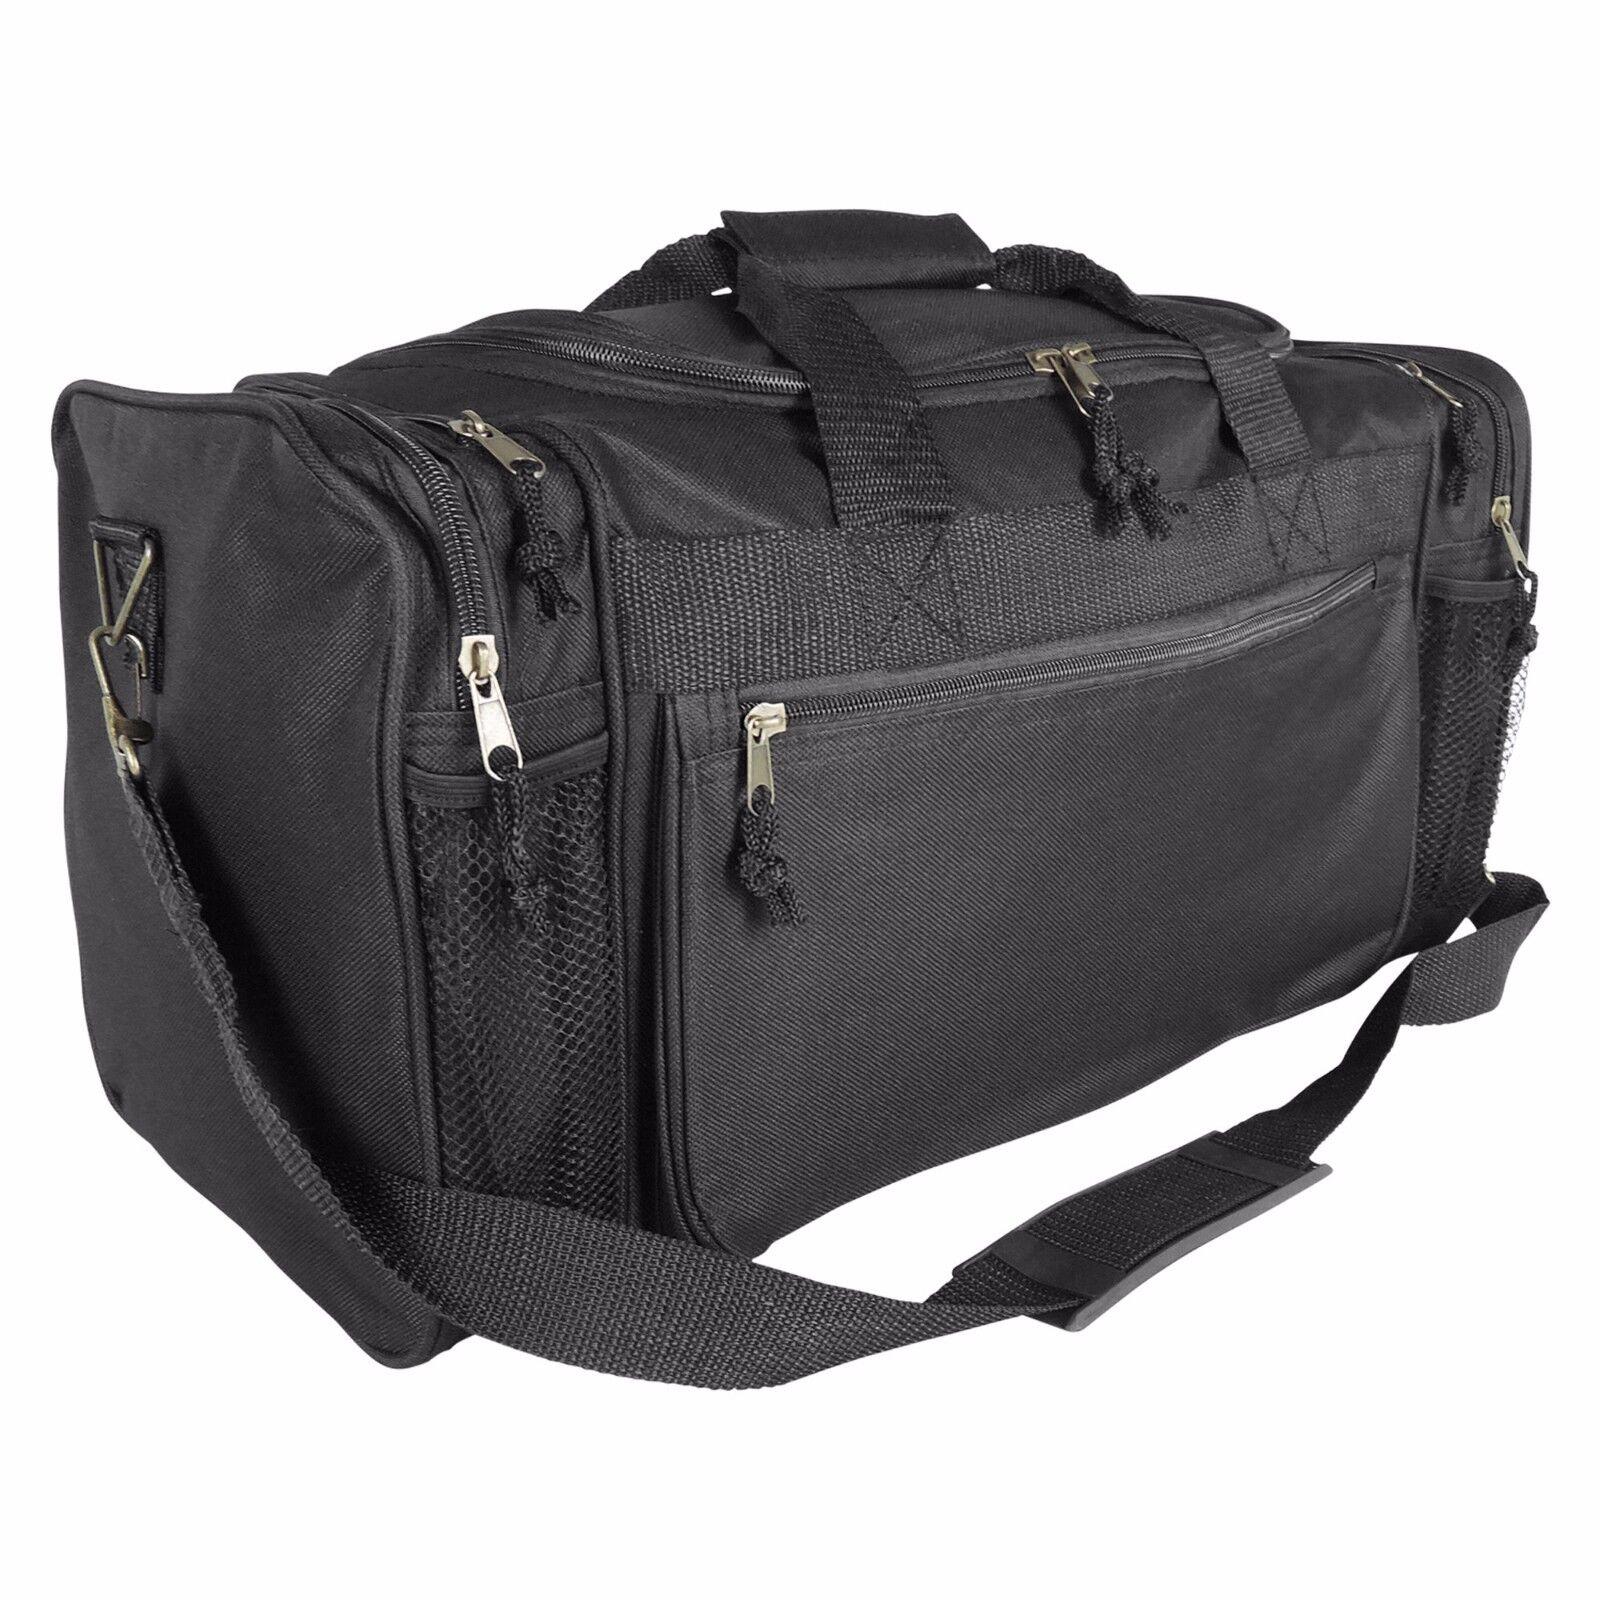 DALIX Brand New Duffle Bag Sports Duffel Bag in Black Gym Ba